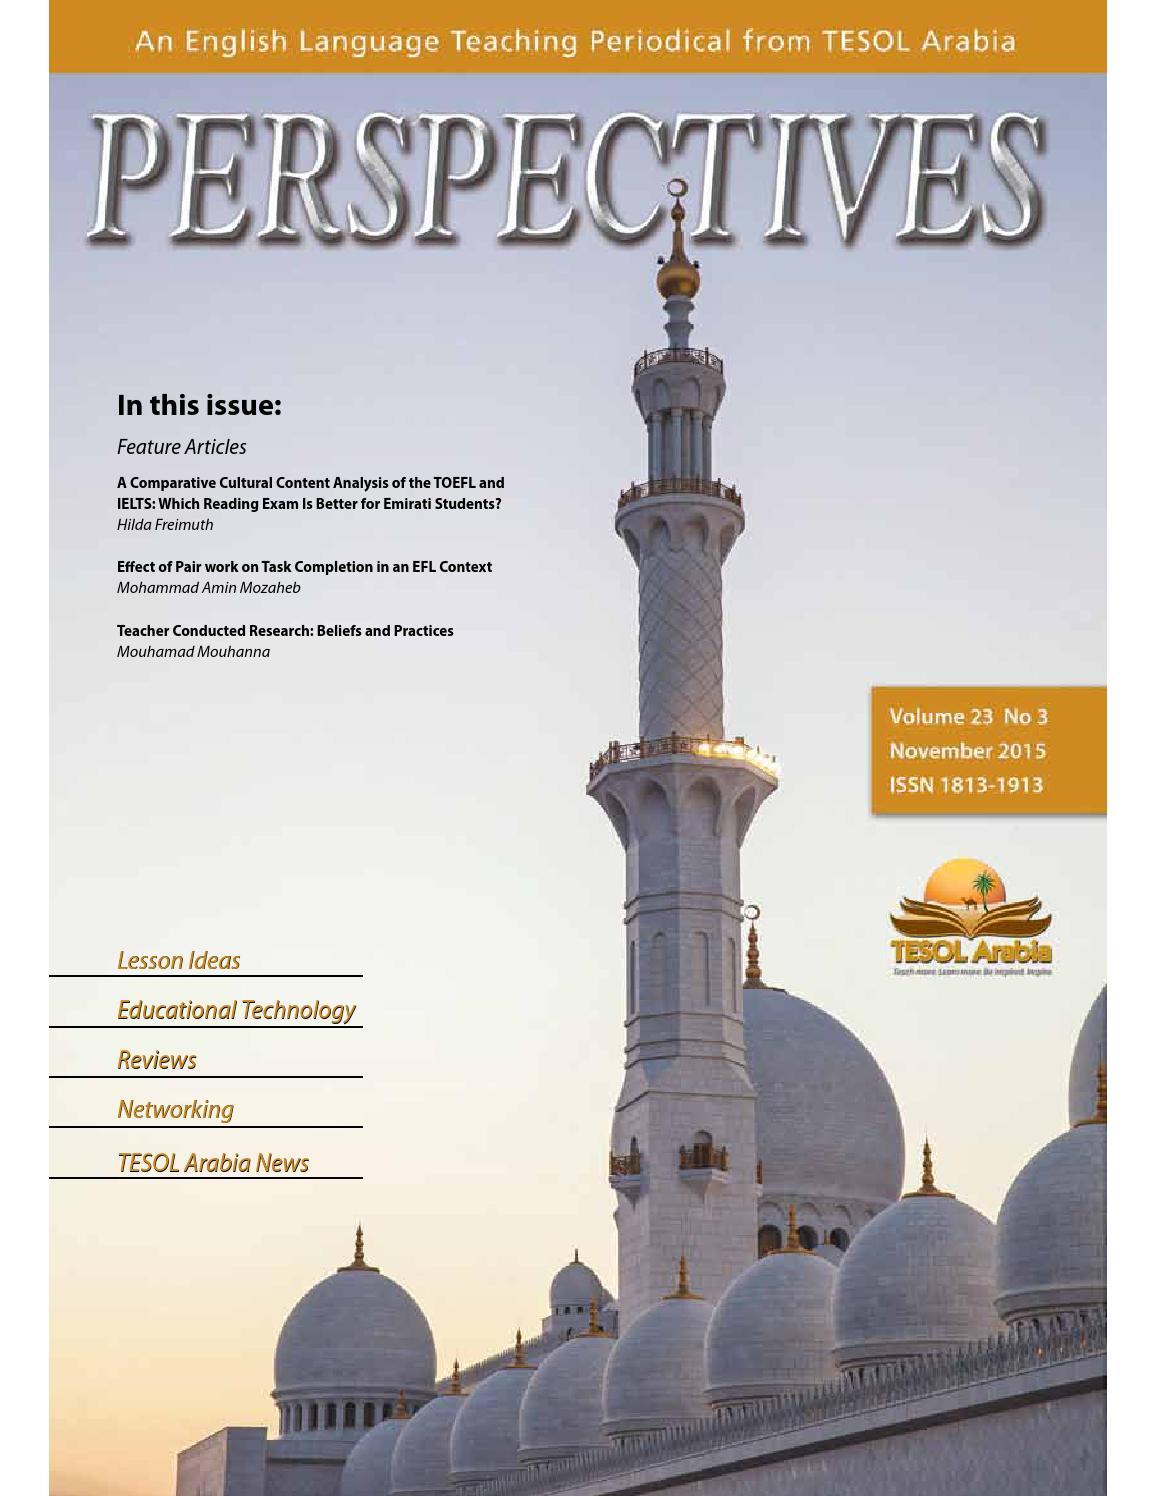 nov 2015 by tesol arabia perspectives issuu